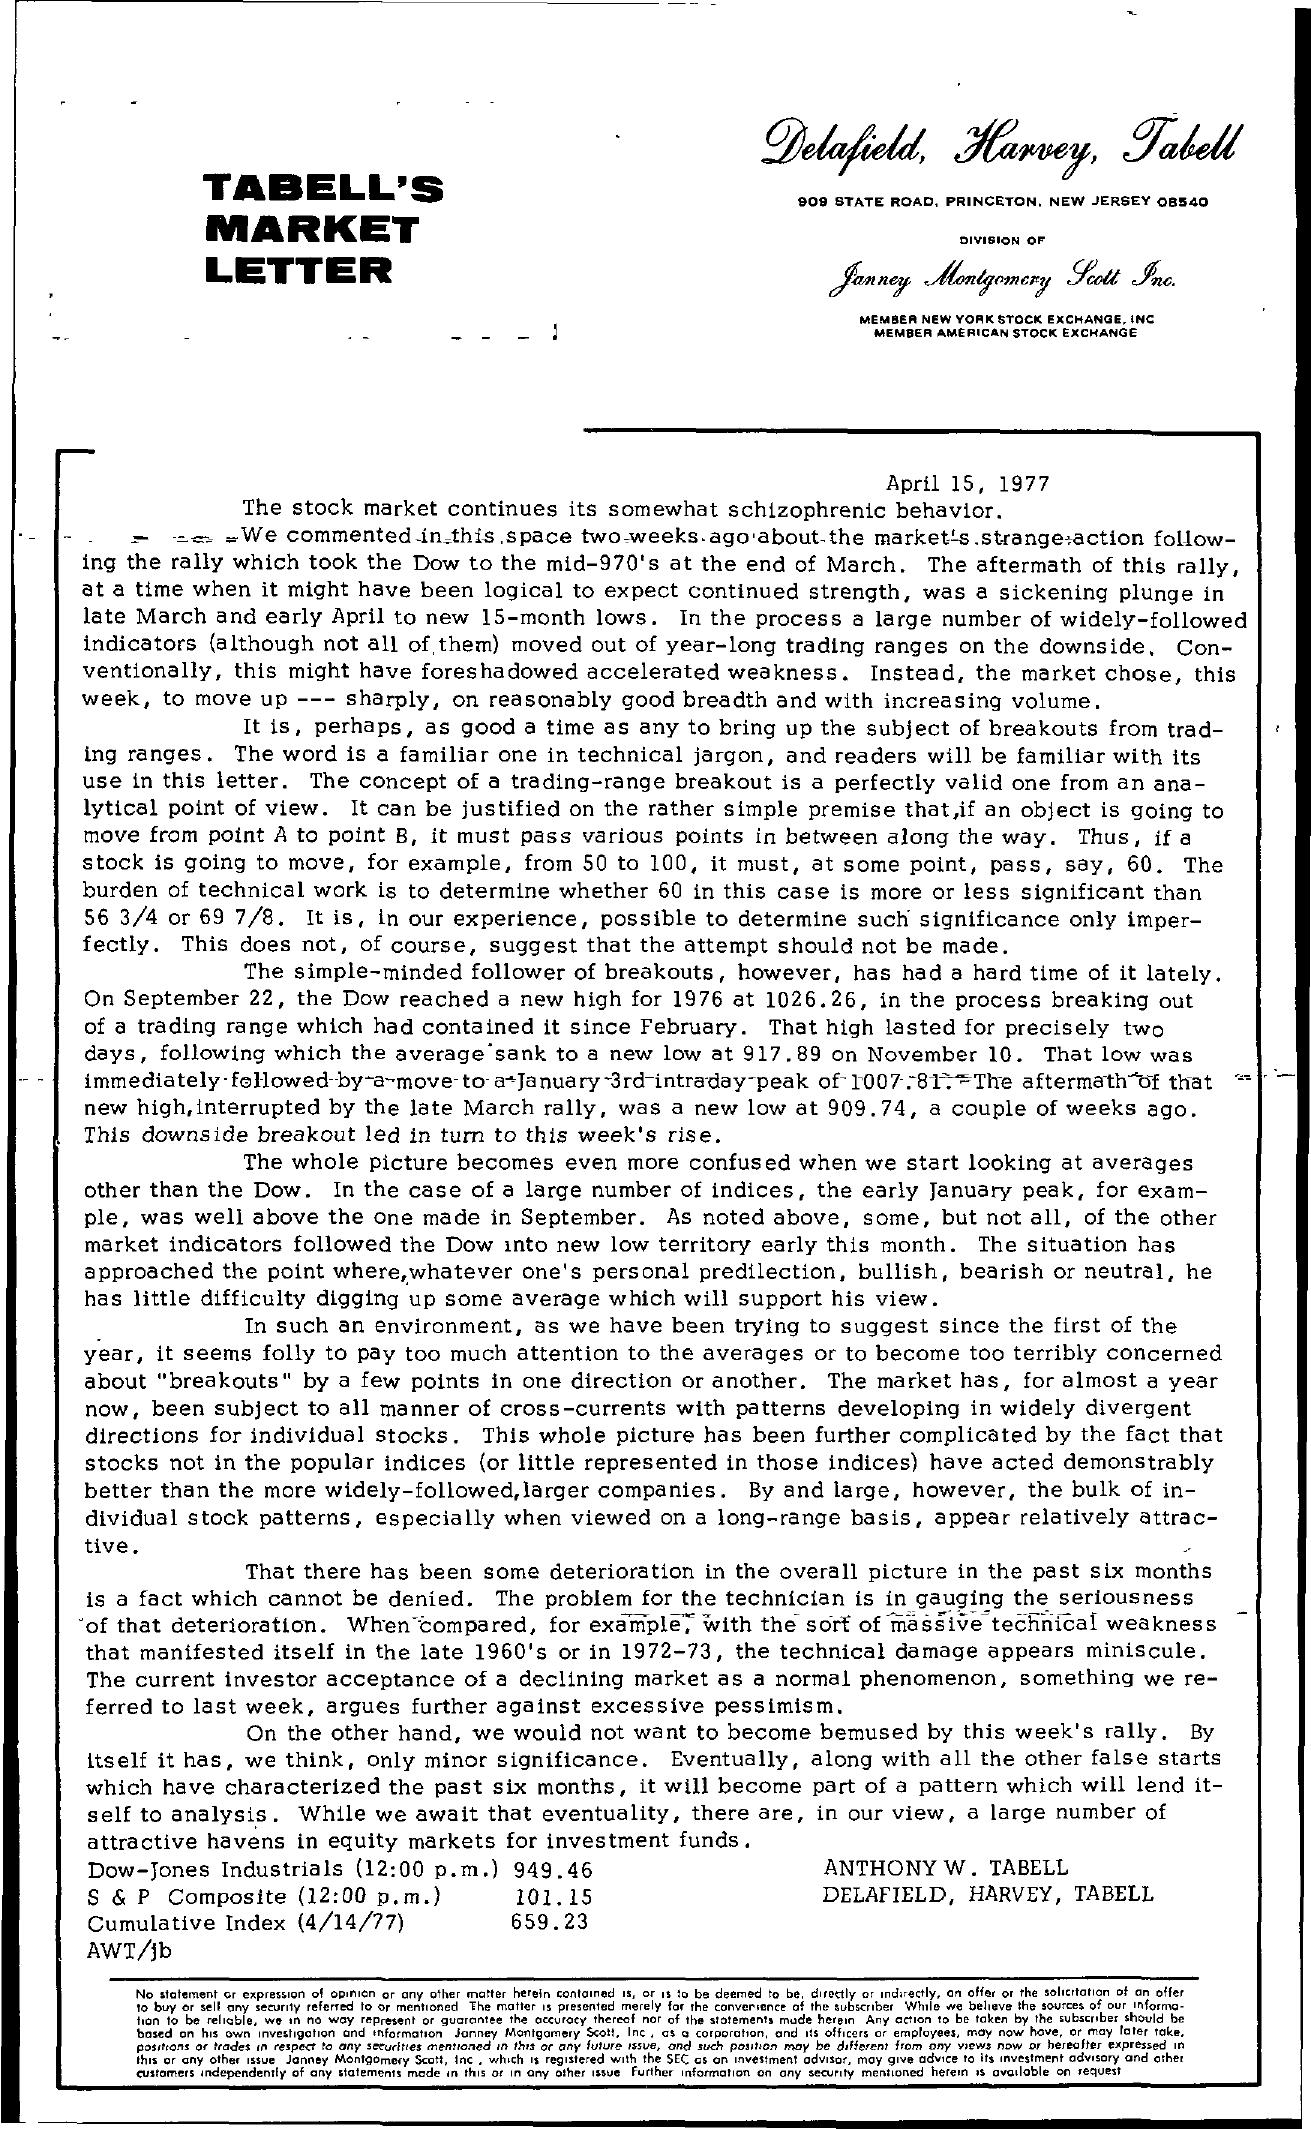 Tabell's Market Letter - April 15, 1977